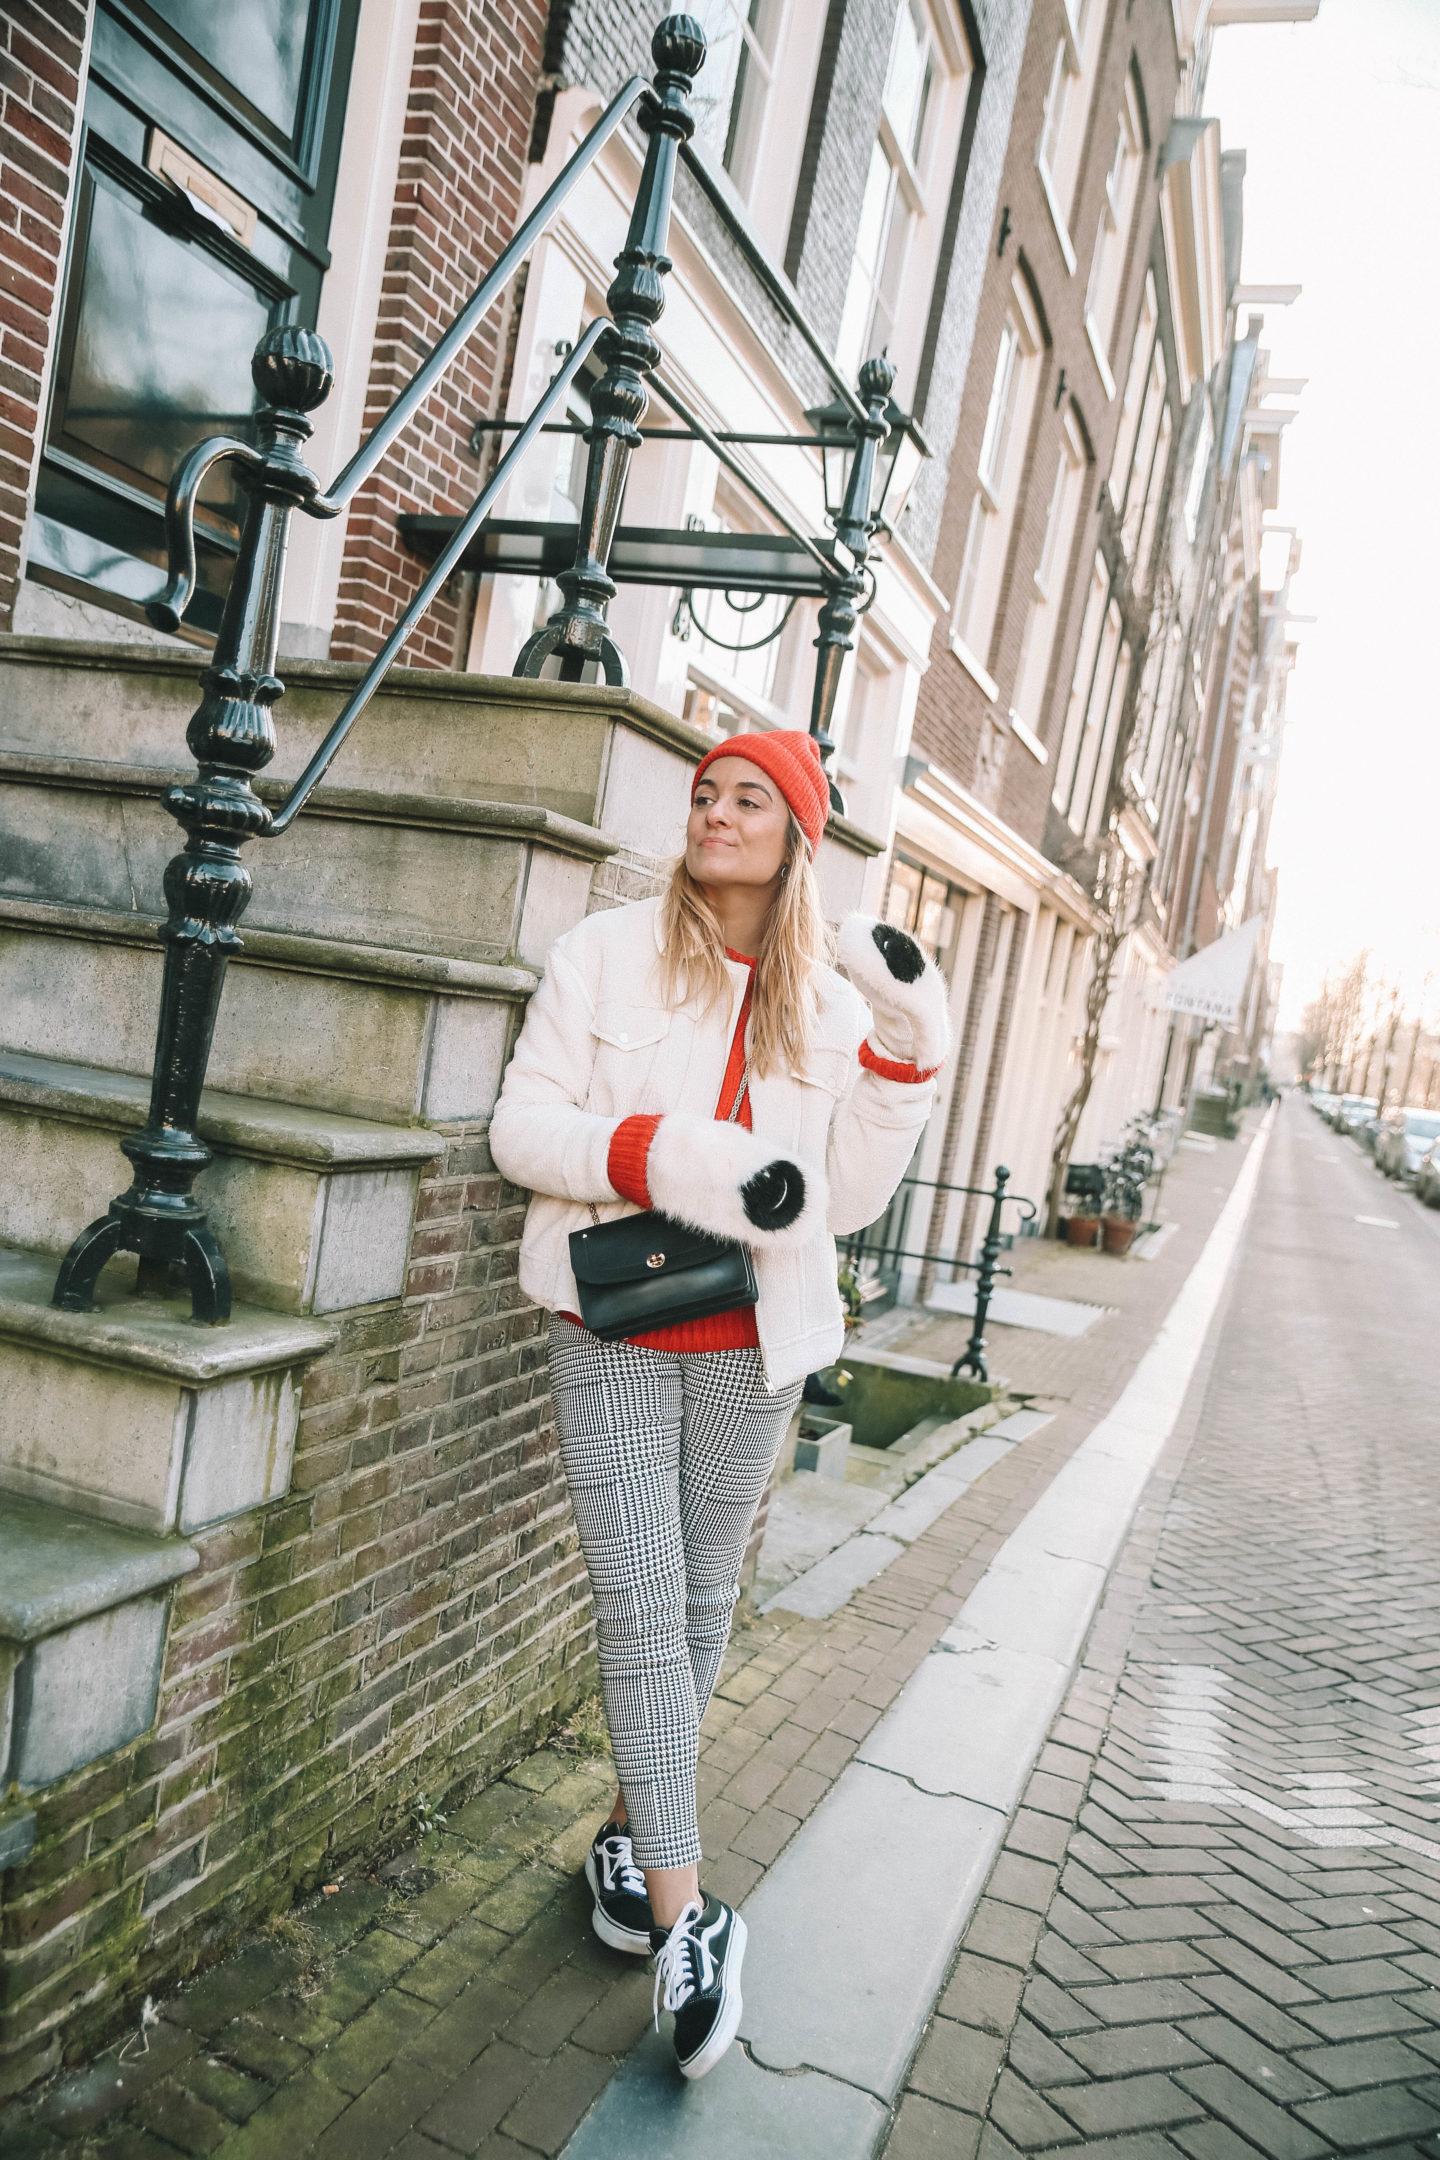 Vans Classic - Blondie baby blog mode et voyages